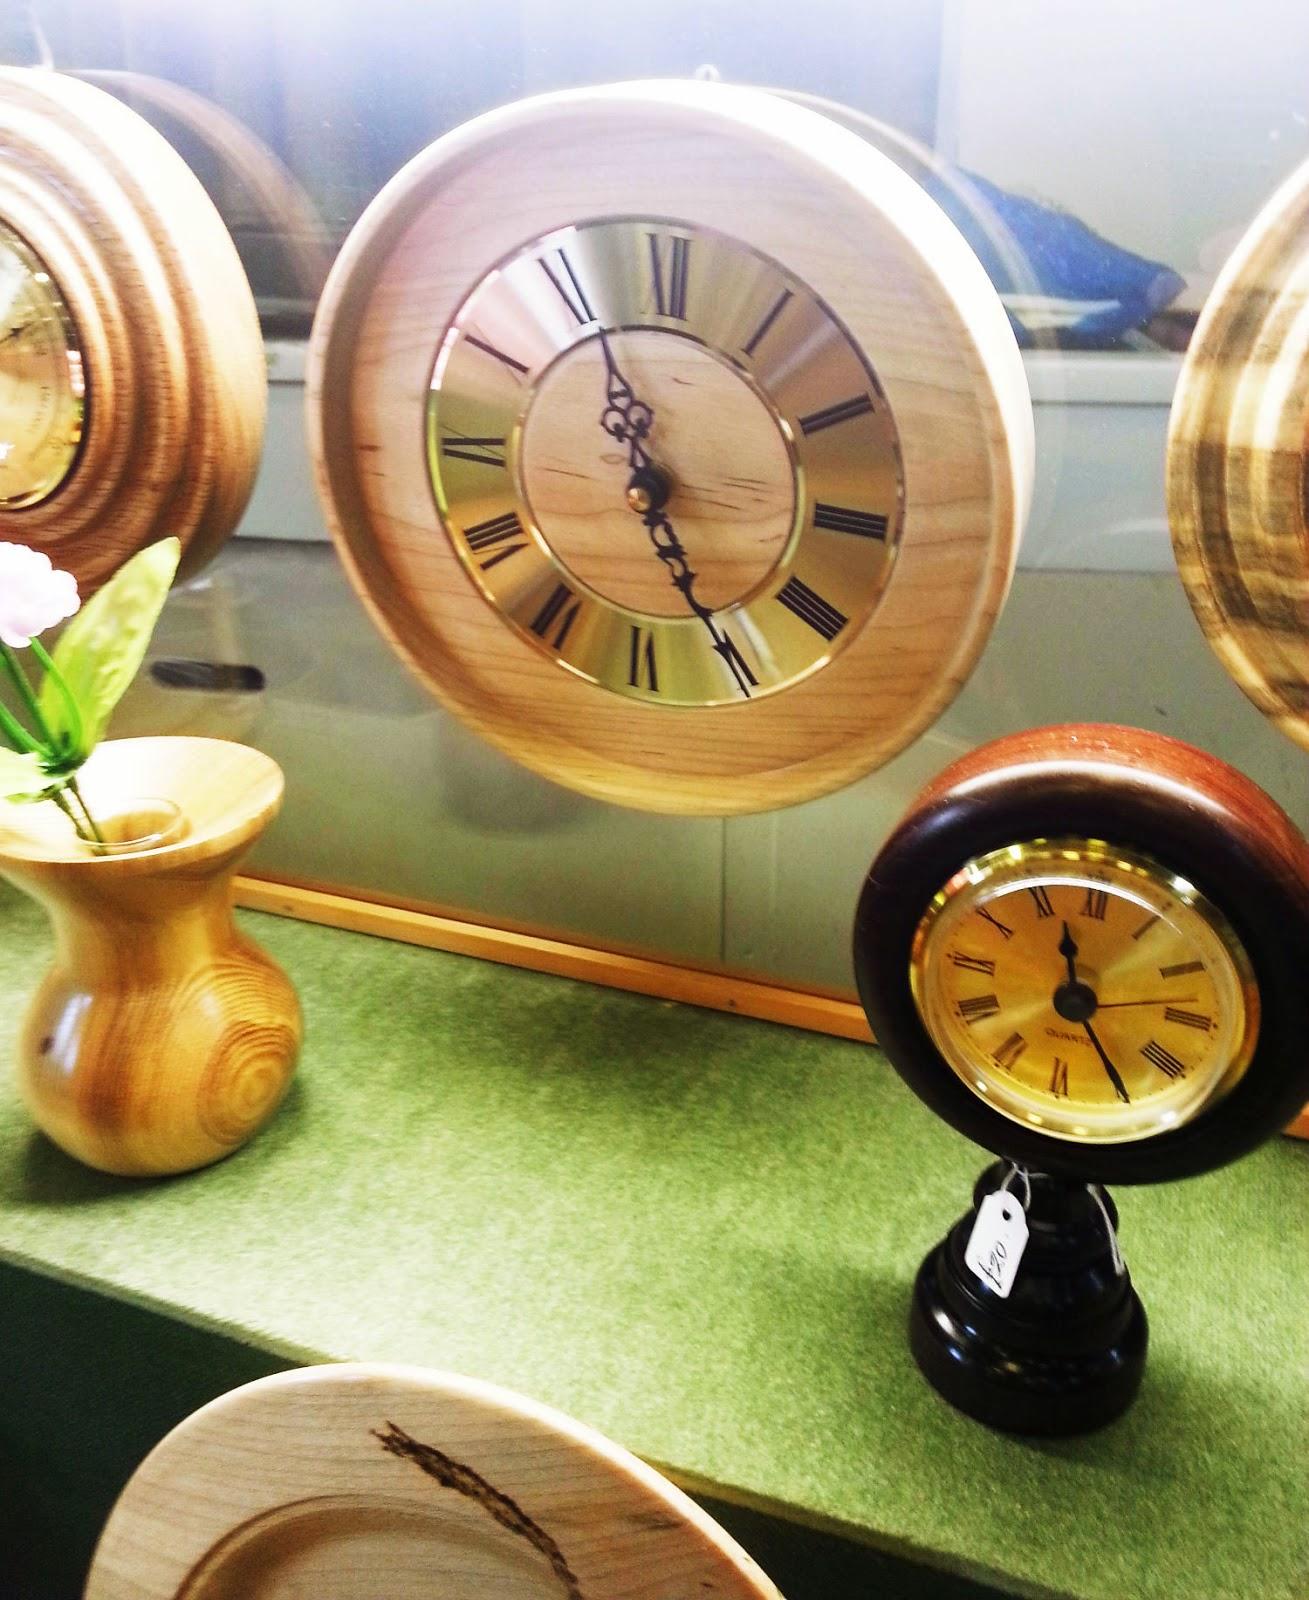 Wiseowls - Pimperne Blandford Wooden clocks